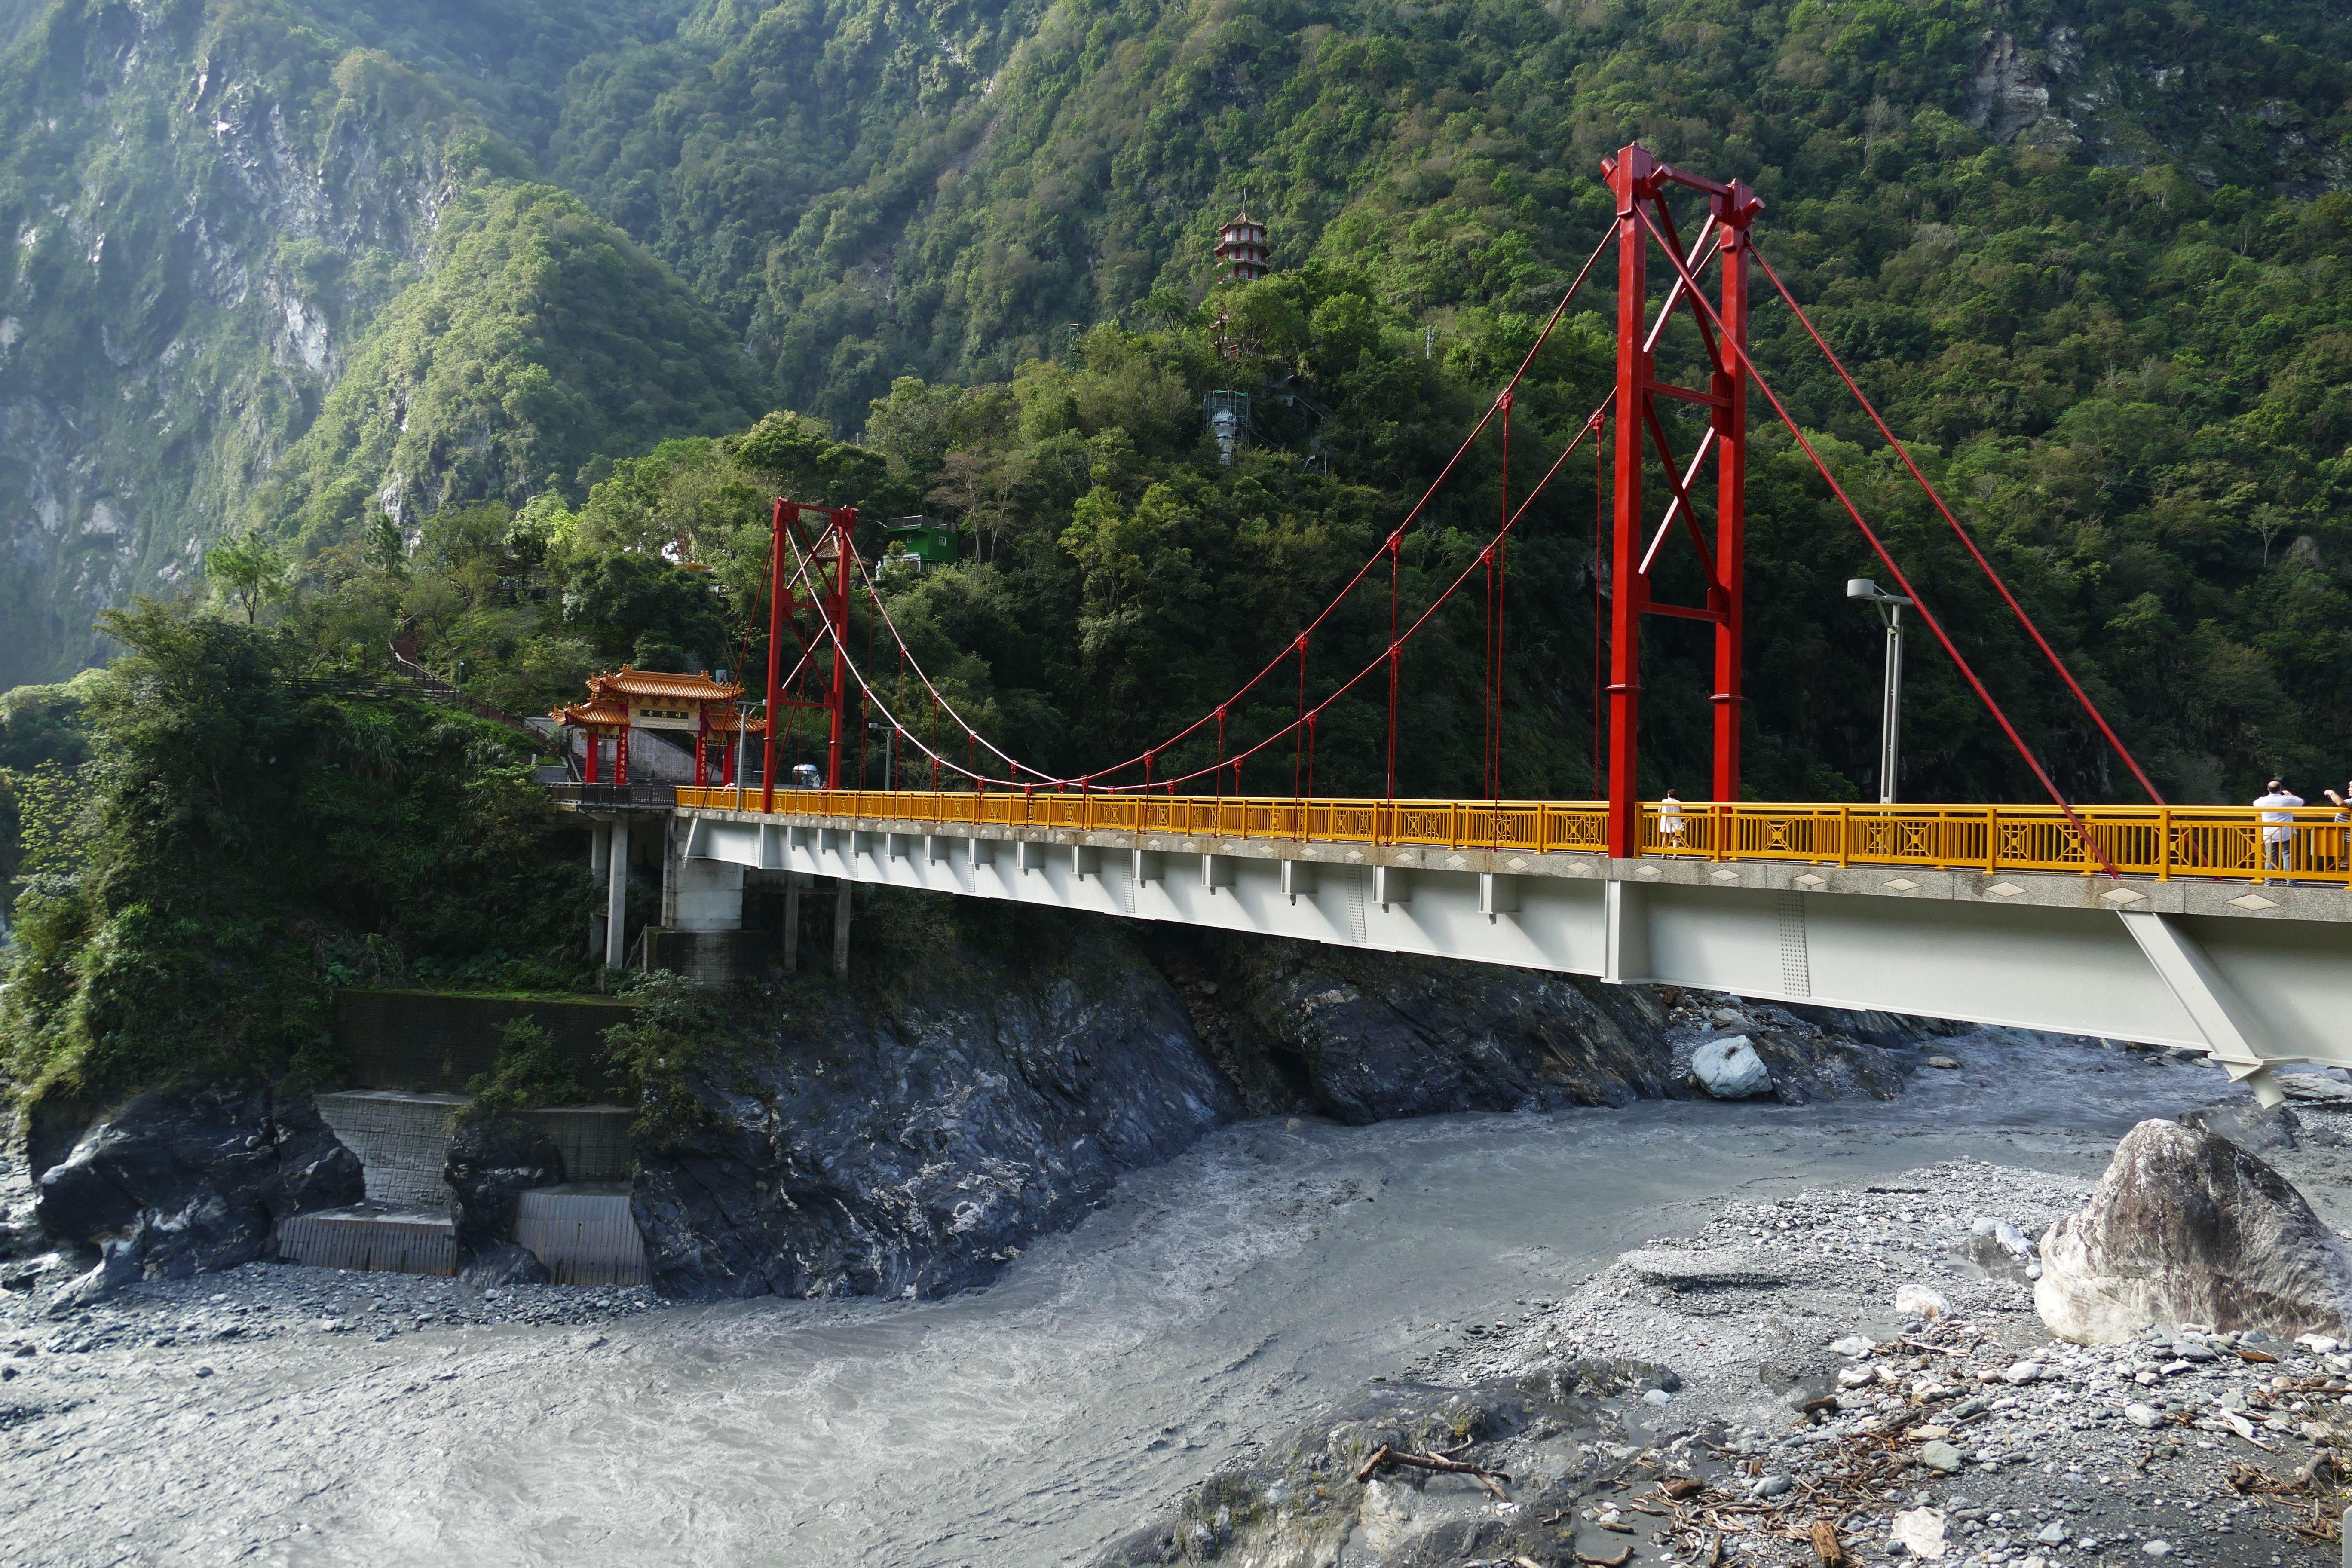 Free Images : landscape, nature, rock, river, suspension